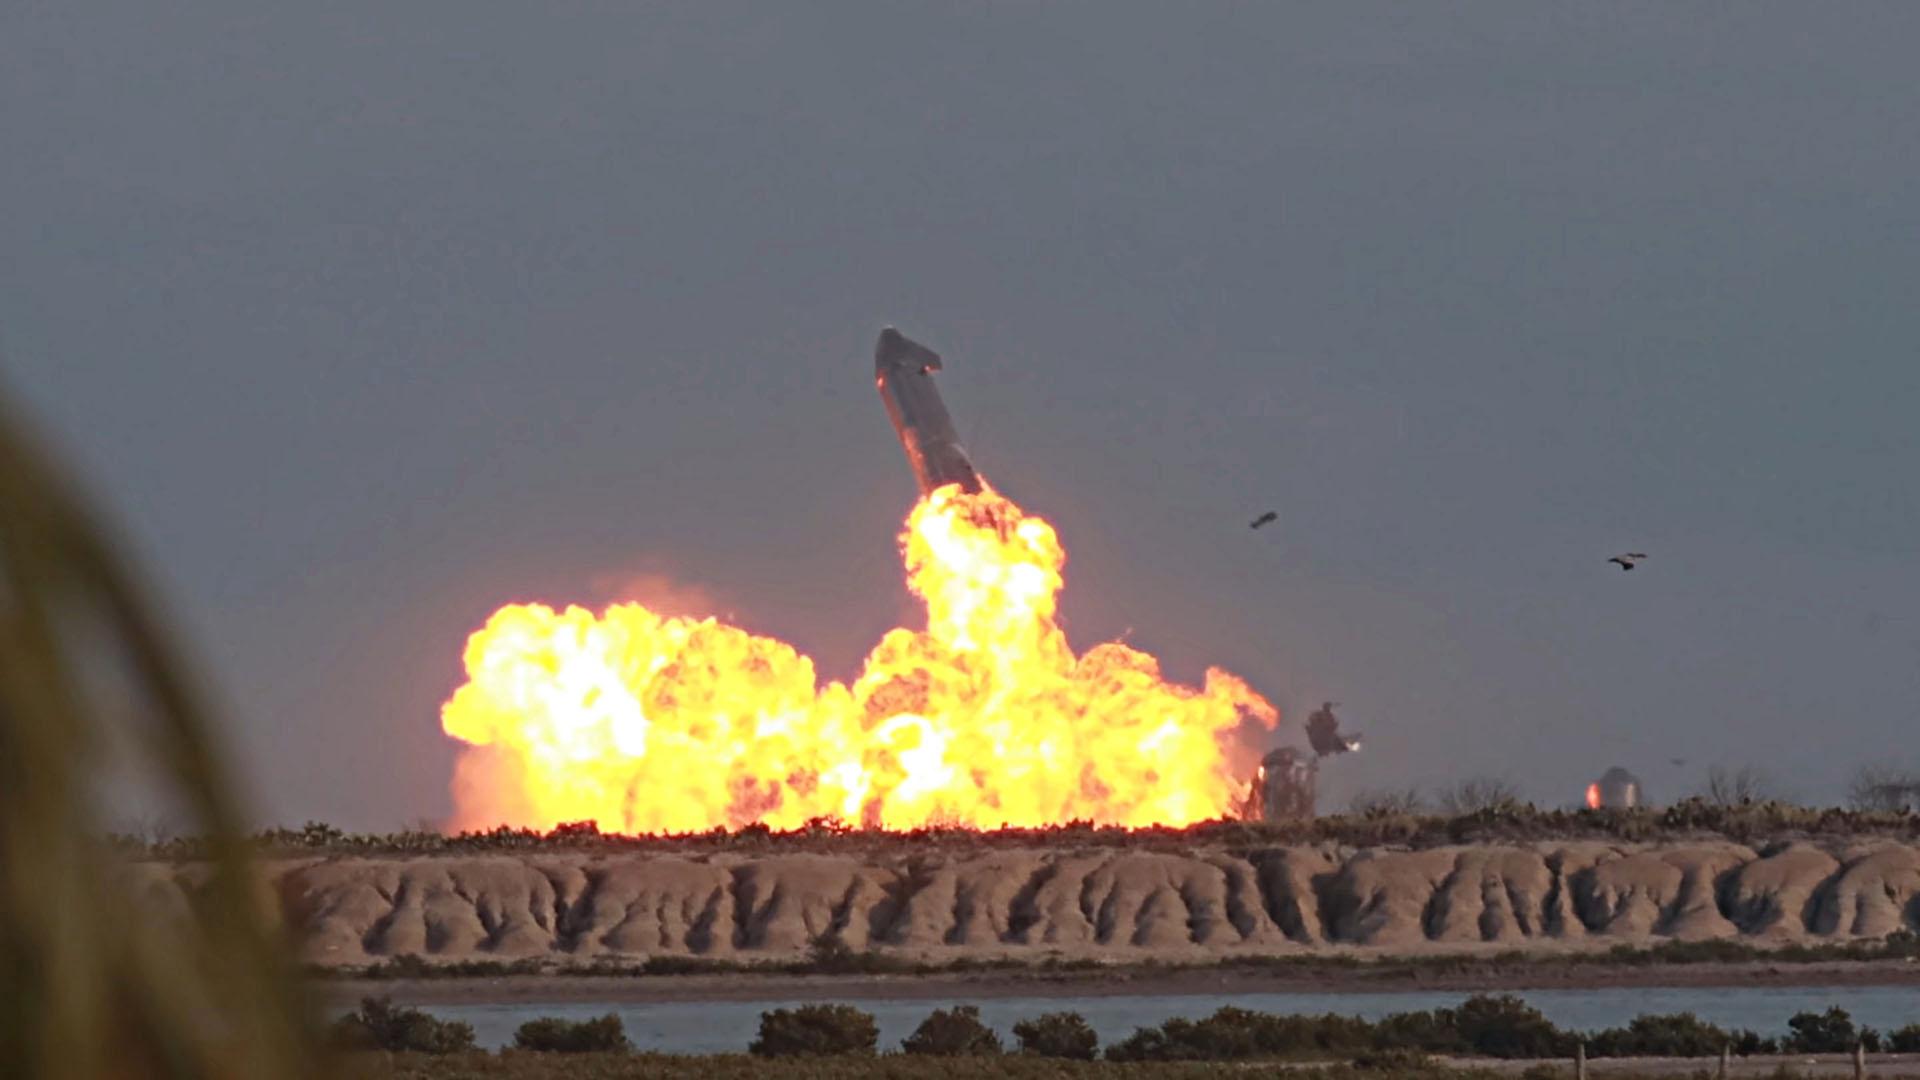 SpaceX Starship SN10 : qu'est-ce qui a pu provoquer l'explosion après l'atterrissage ? - Numerama